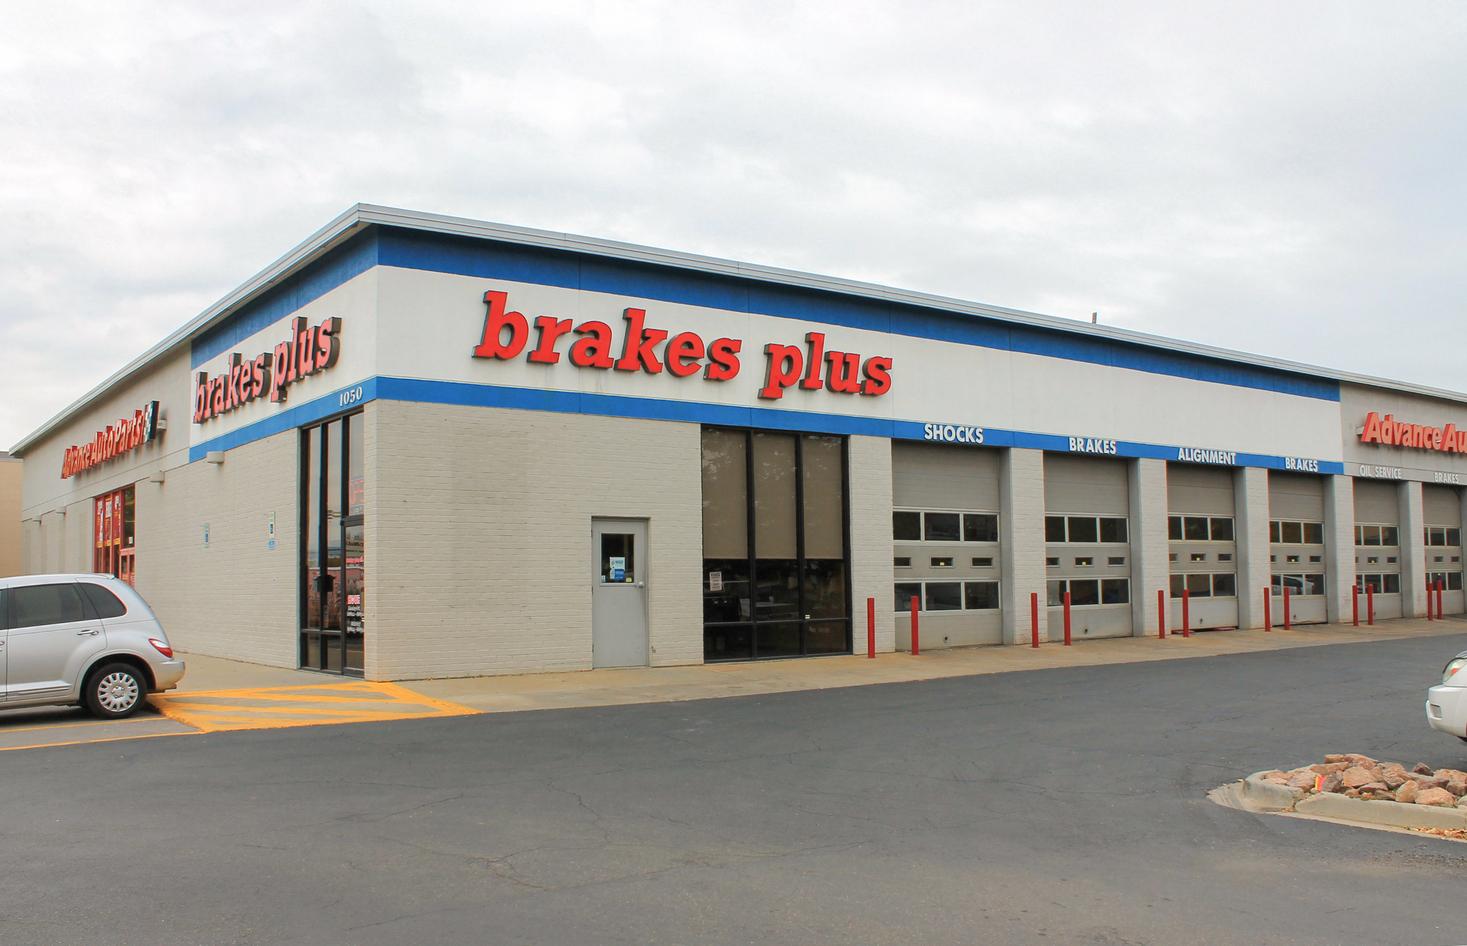 Brakes Plus at Longmont, CO - Safeway Plaza